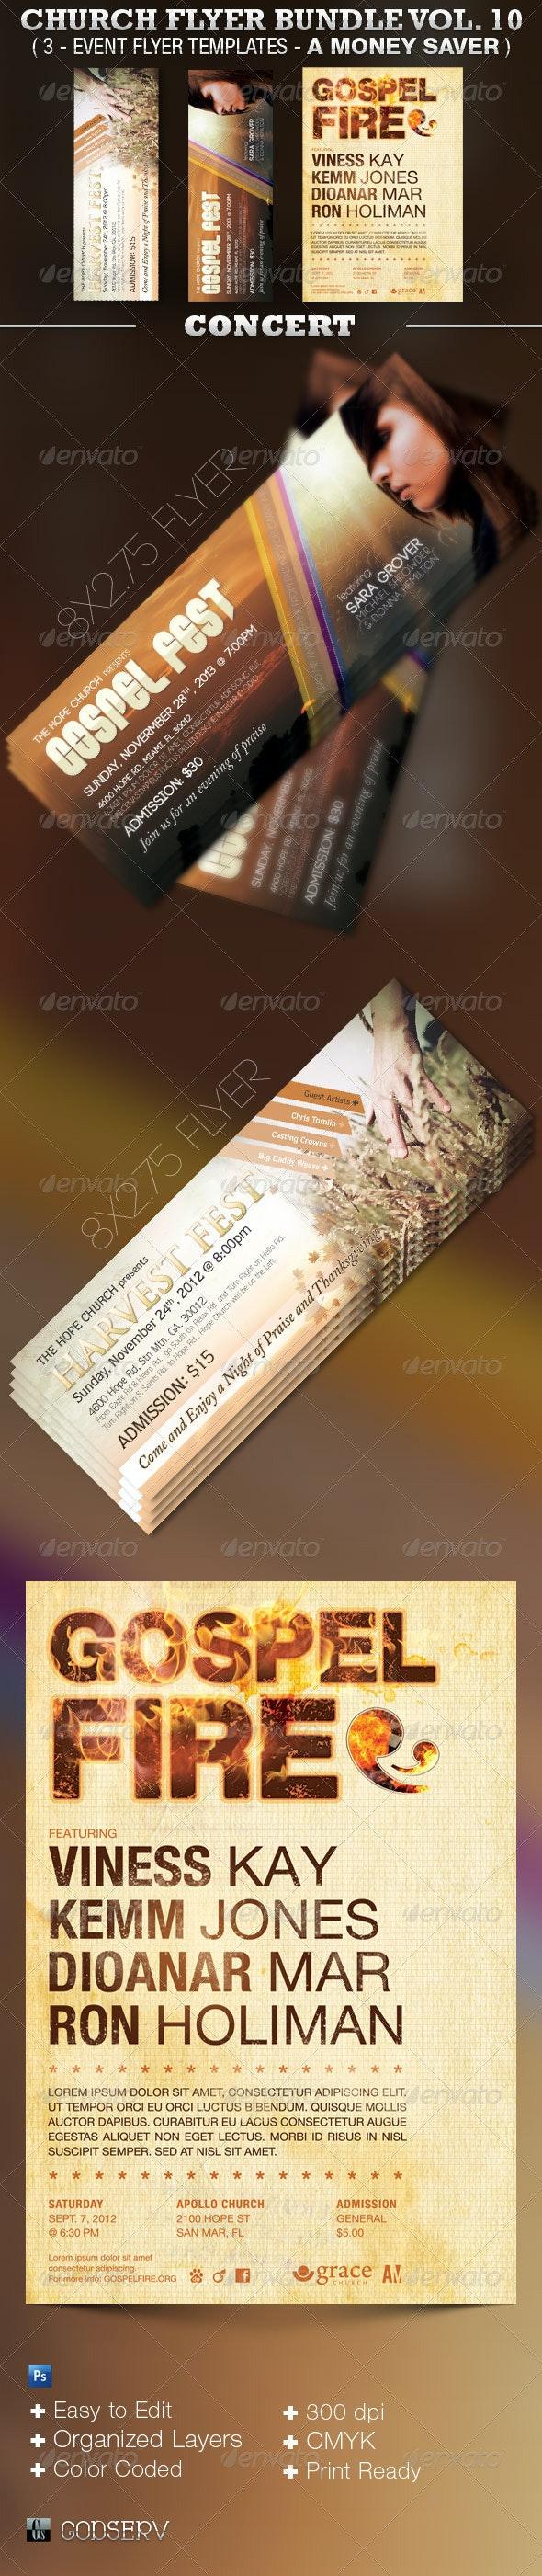 Concert Church Flyer Template Bundle Vol 10 - Church Flyers